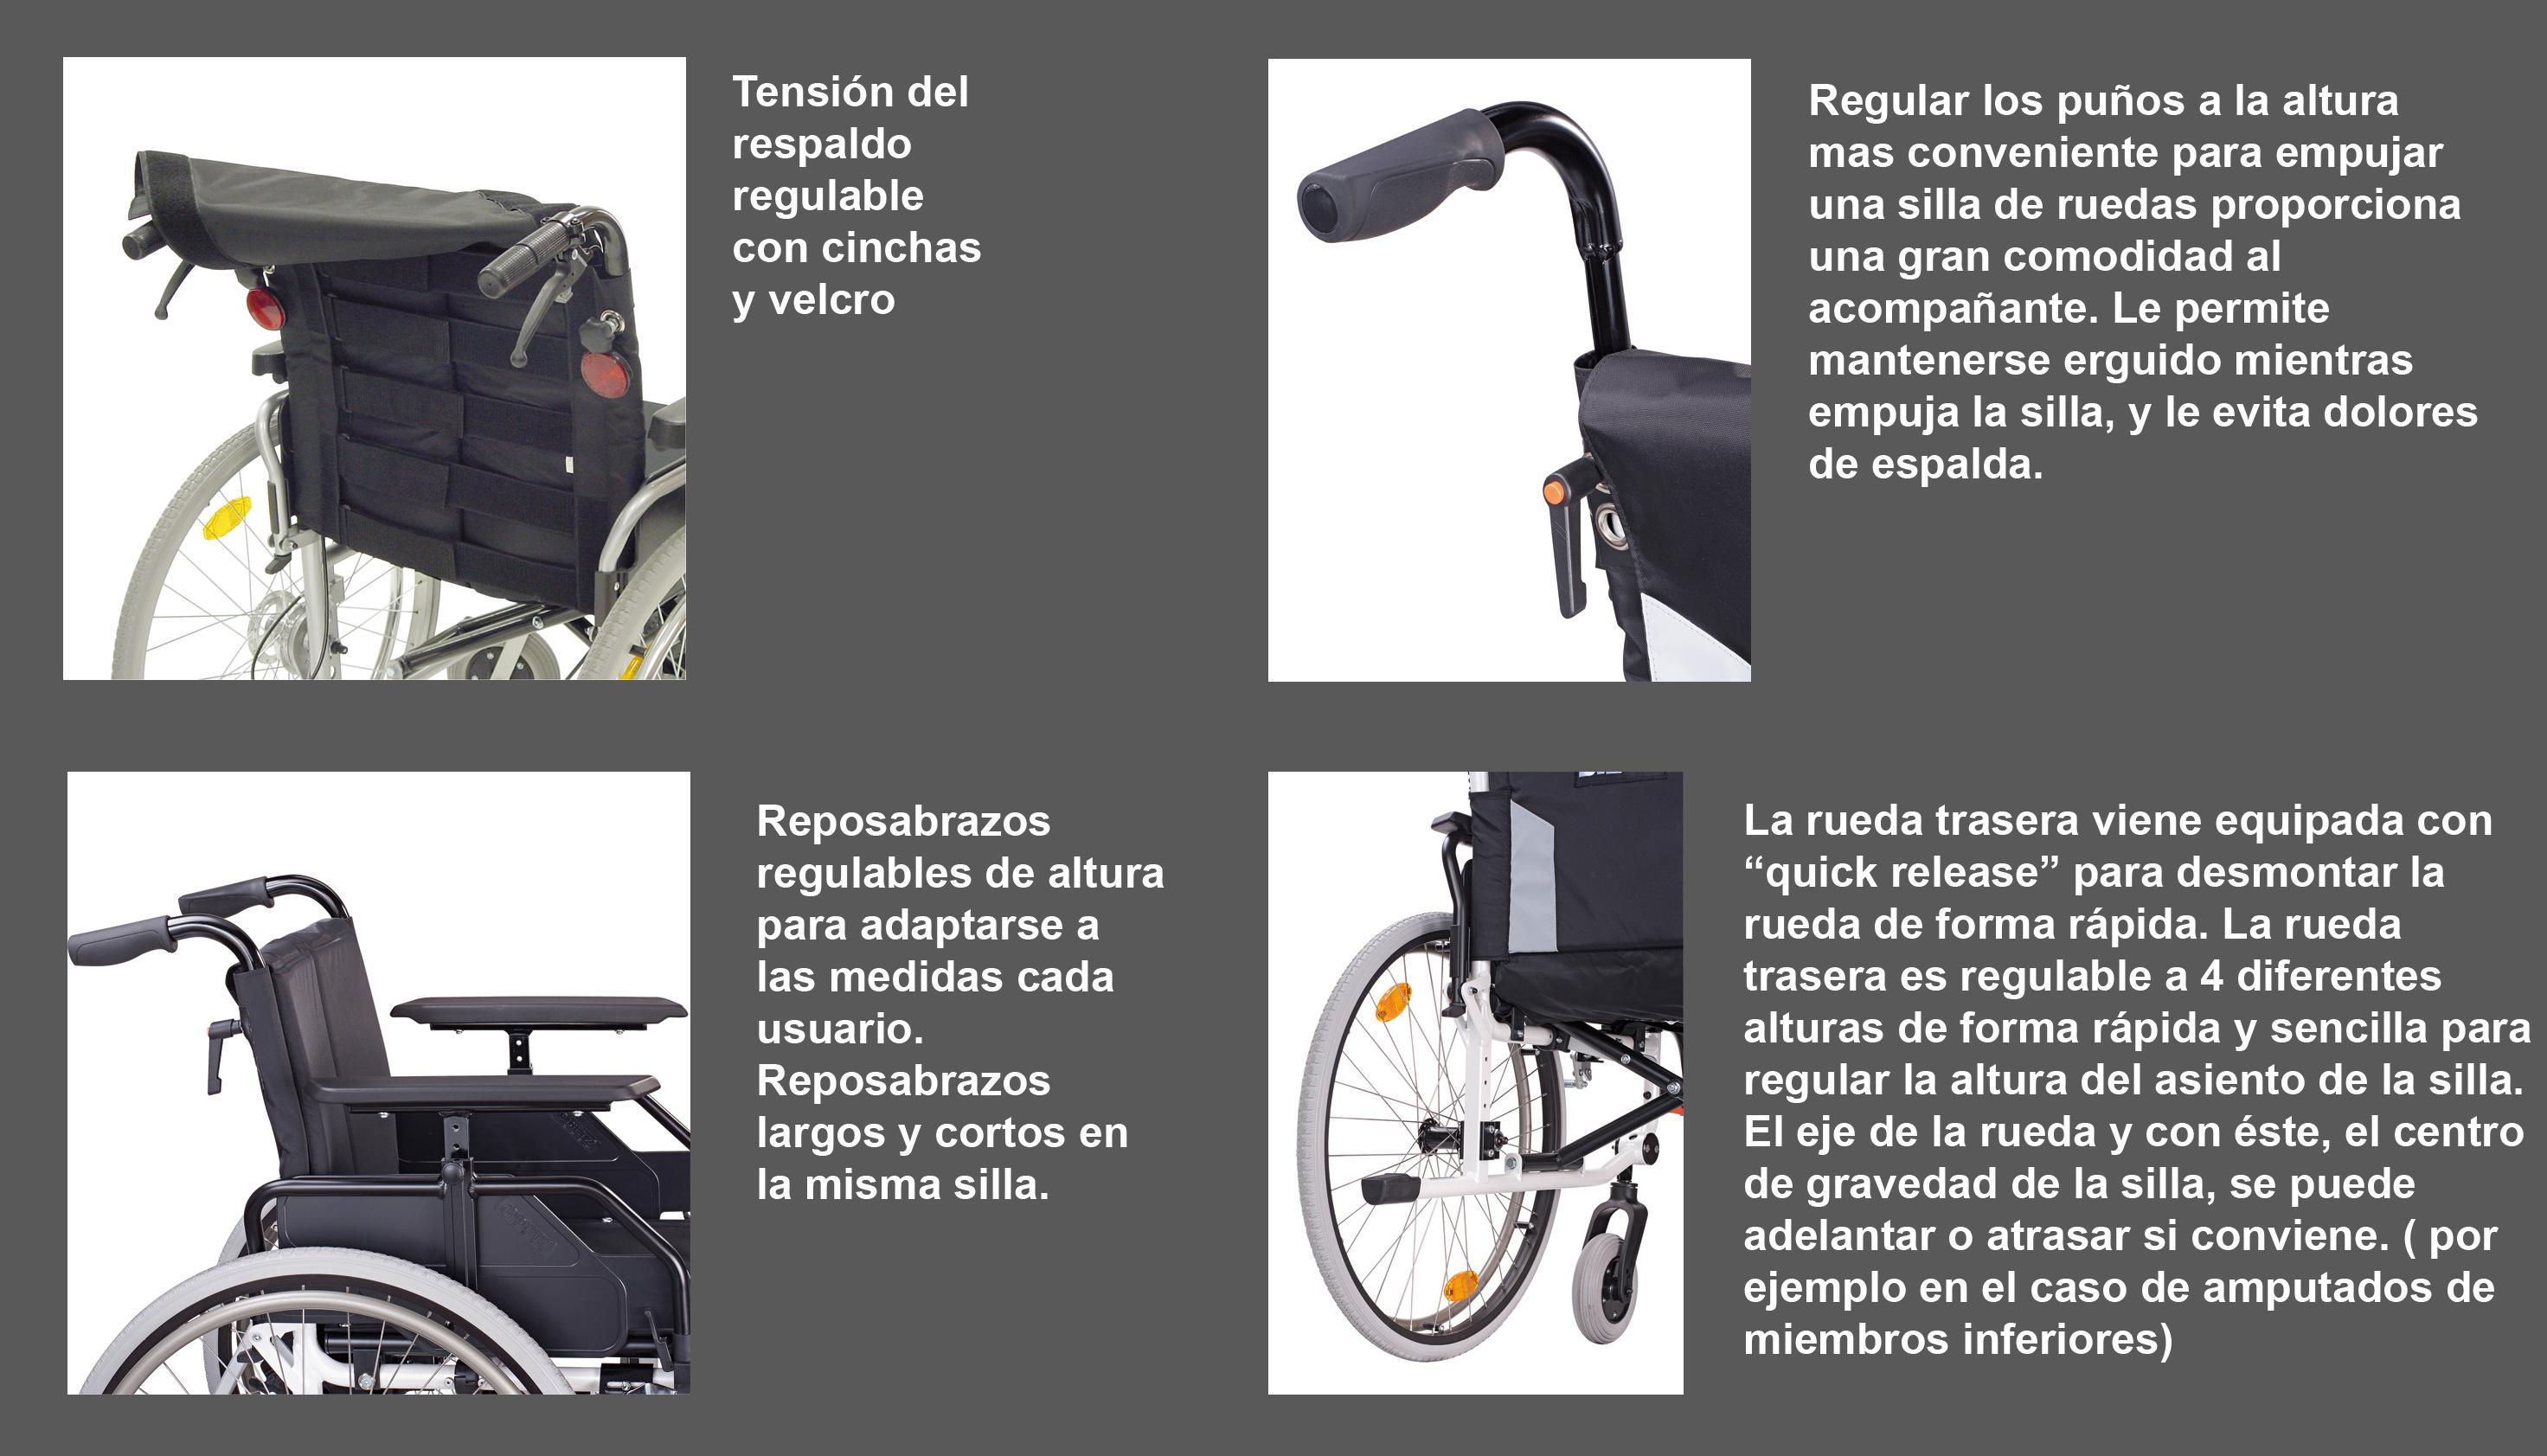 De Silla Ortopèdia Diagonal SProductos Aluminio Gran Caneo Farmacia Mar Ruedas Calidad 0OPnwk